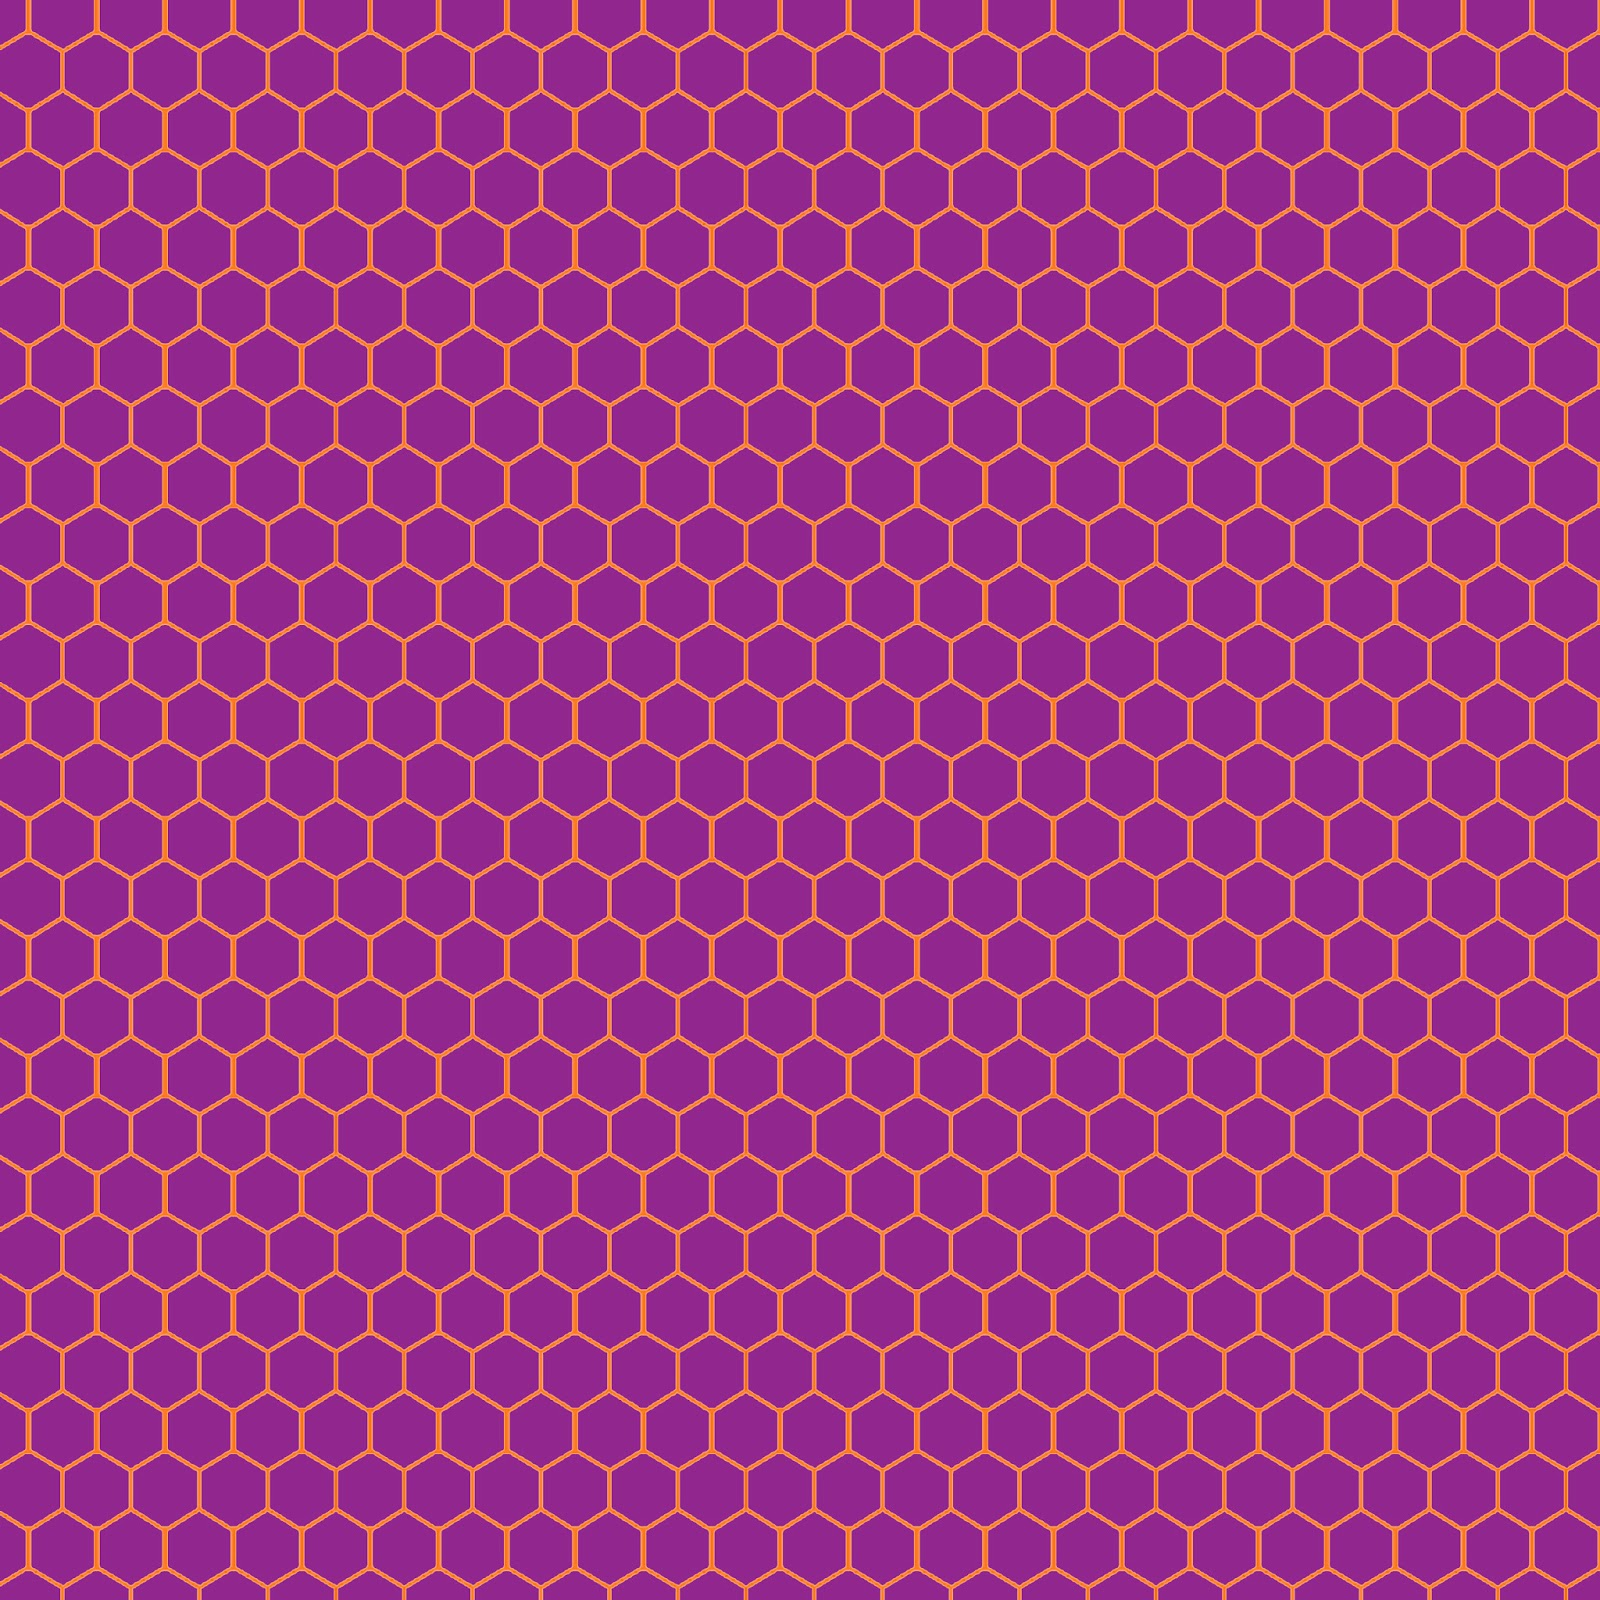 Printable Wallpaper: Doodlecraft: Hexagon Honeycomb FREEBIE Background Pattern